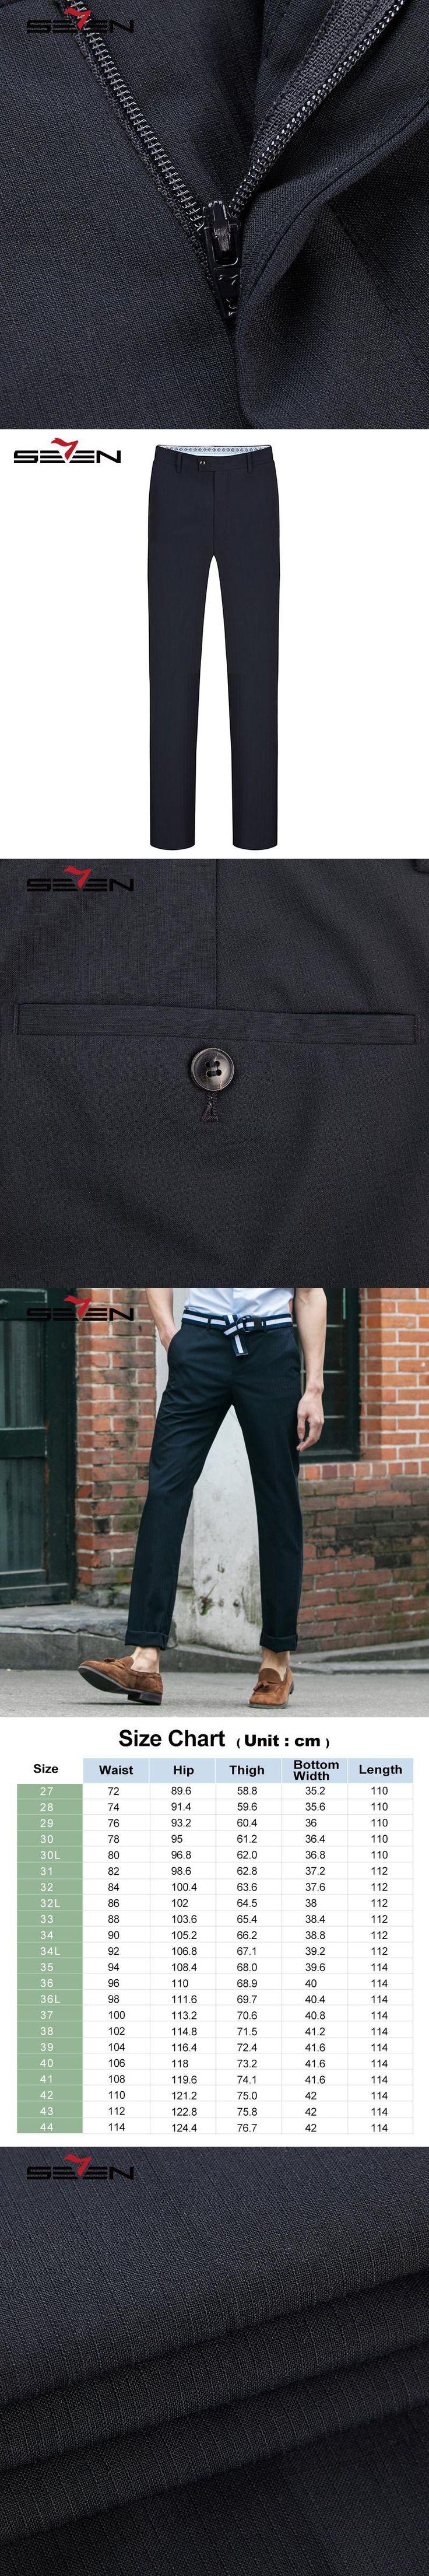 Seven7 Brand Men Formal Suit Pants Wool Blended Exquisite Long Pants Regular Fit Business Front Flat Dress Trousers 112B70060